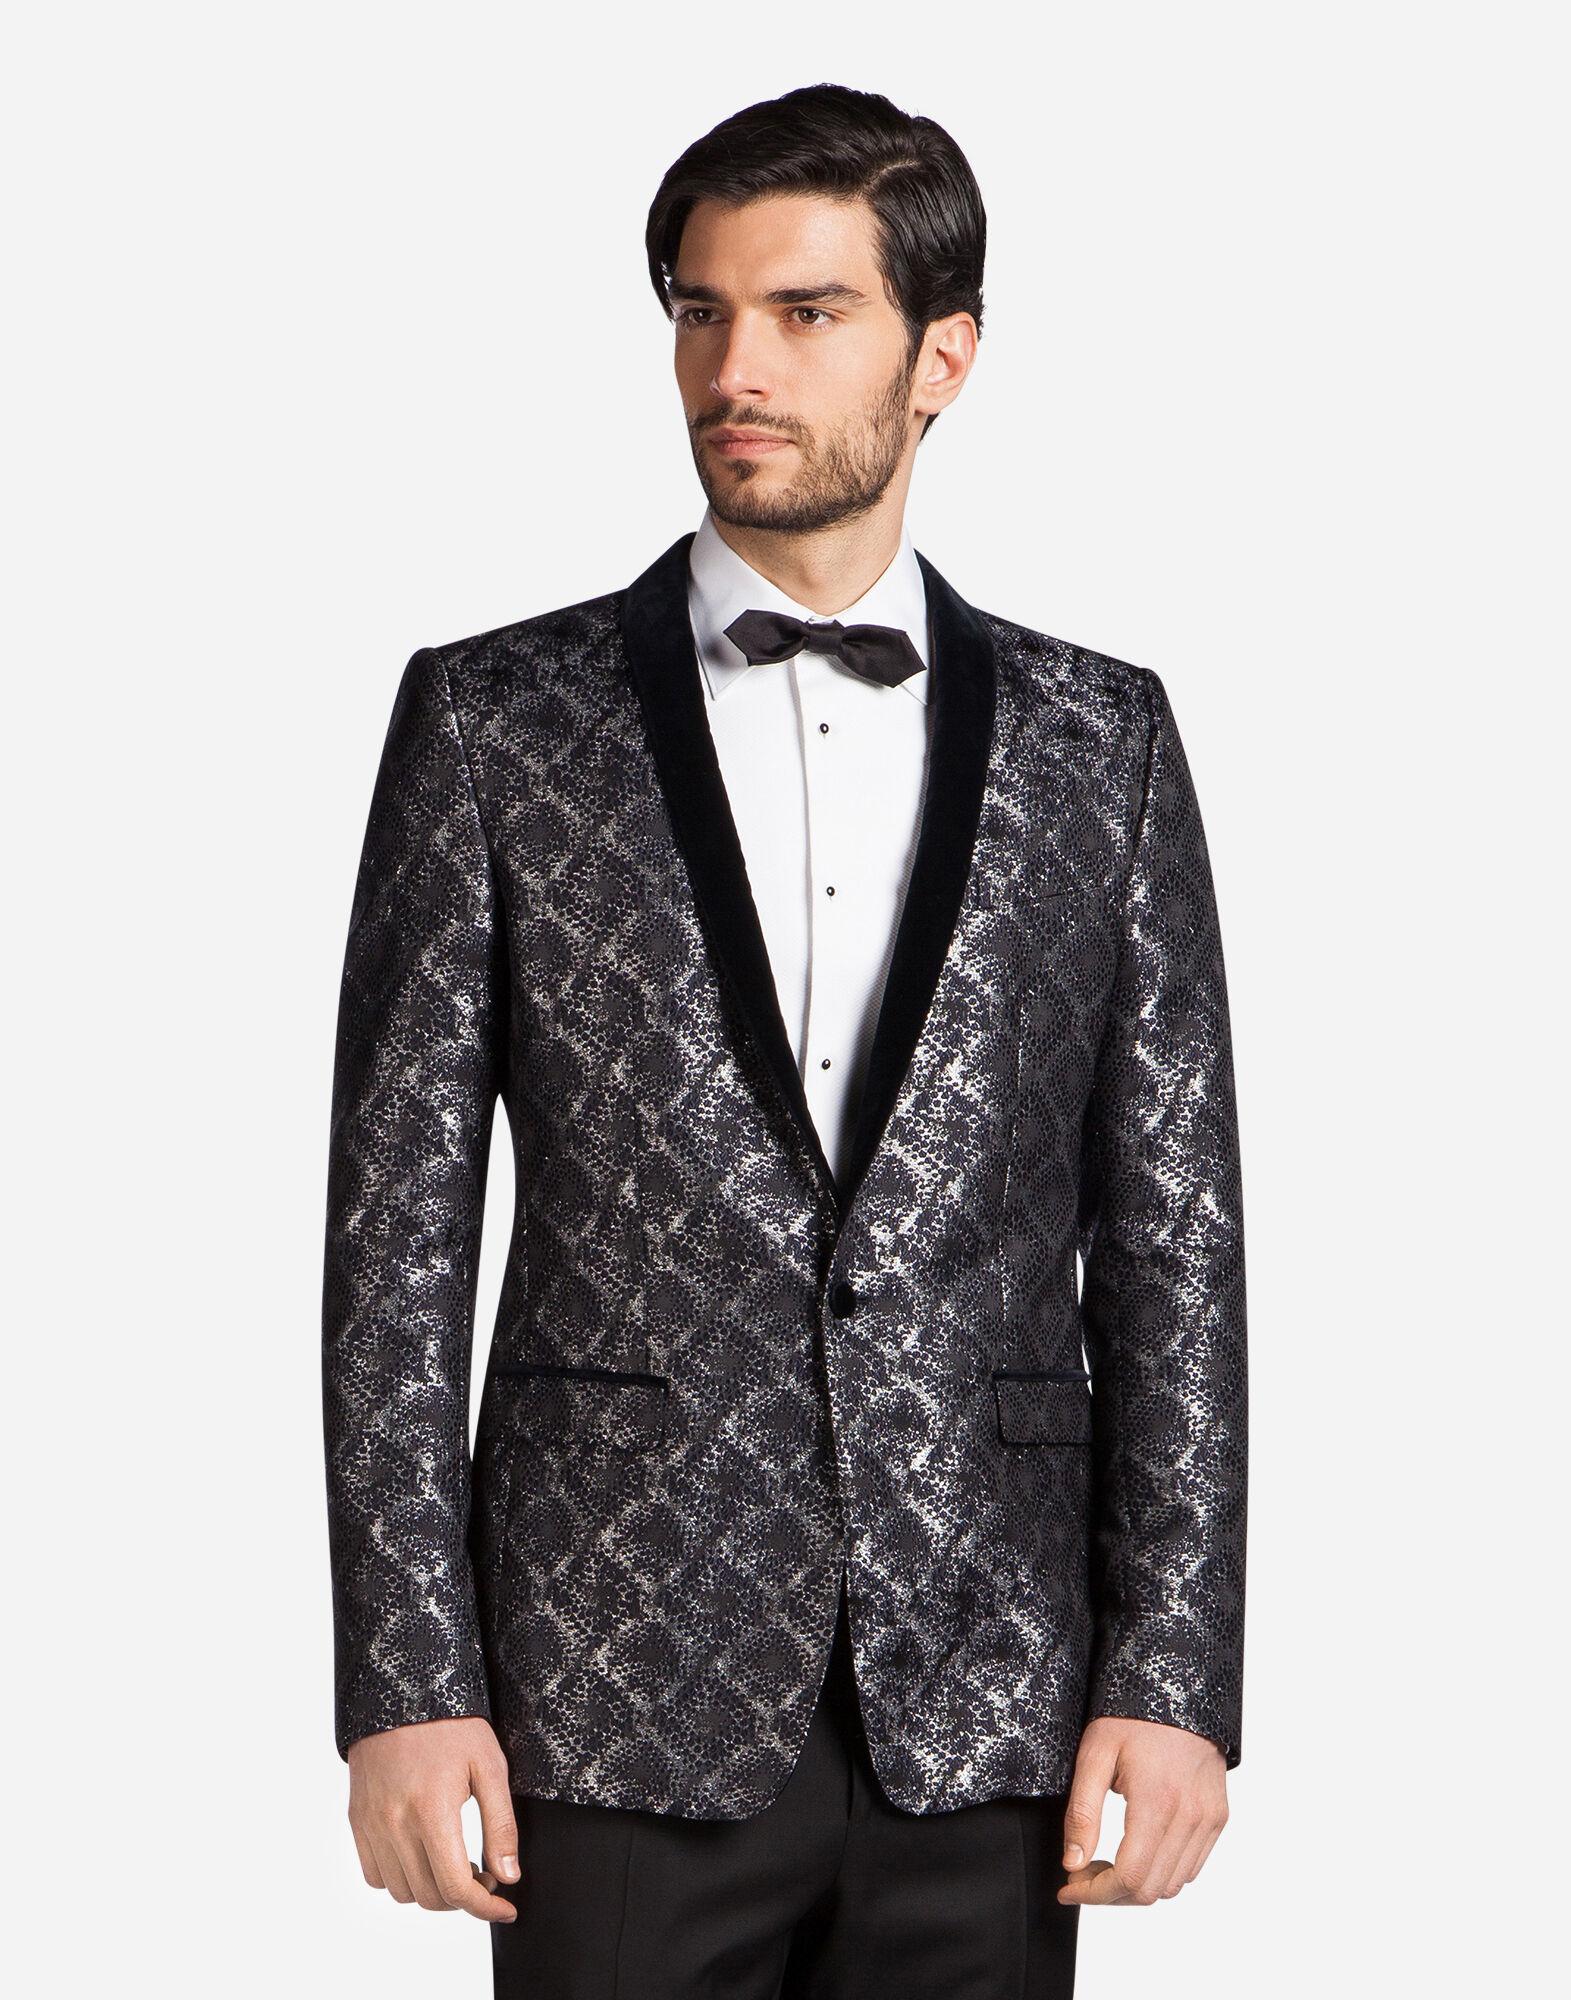 Dolce&Gabbana TUXEDO BLAZER IN LUREX JACQUARD